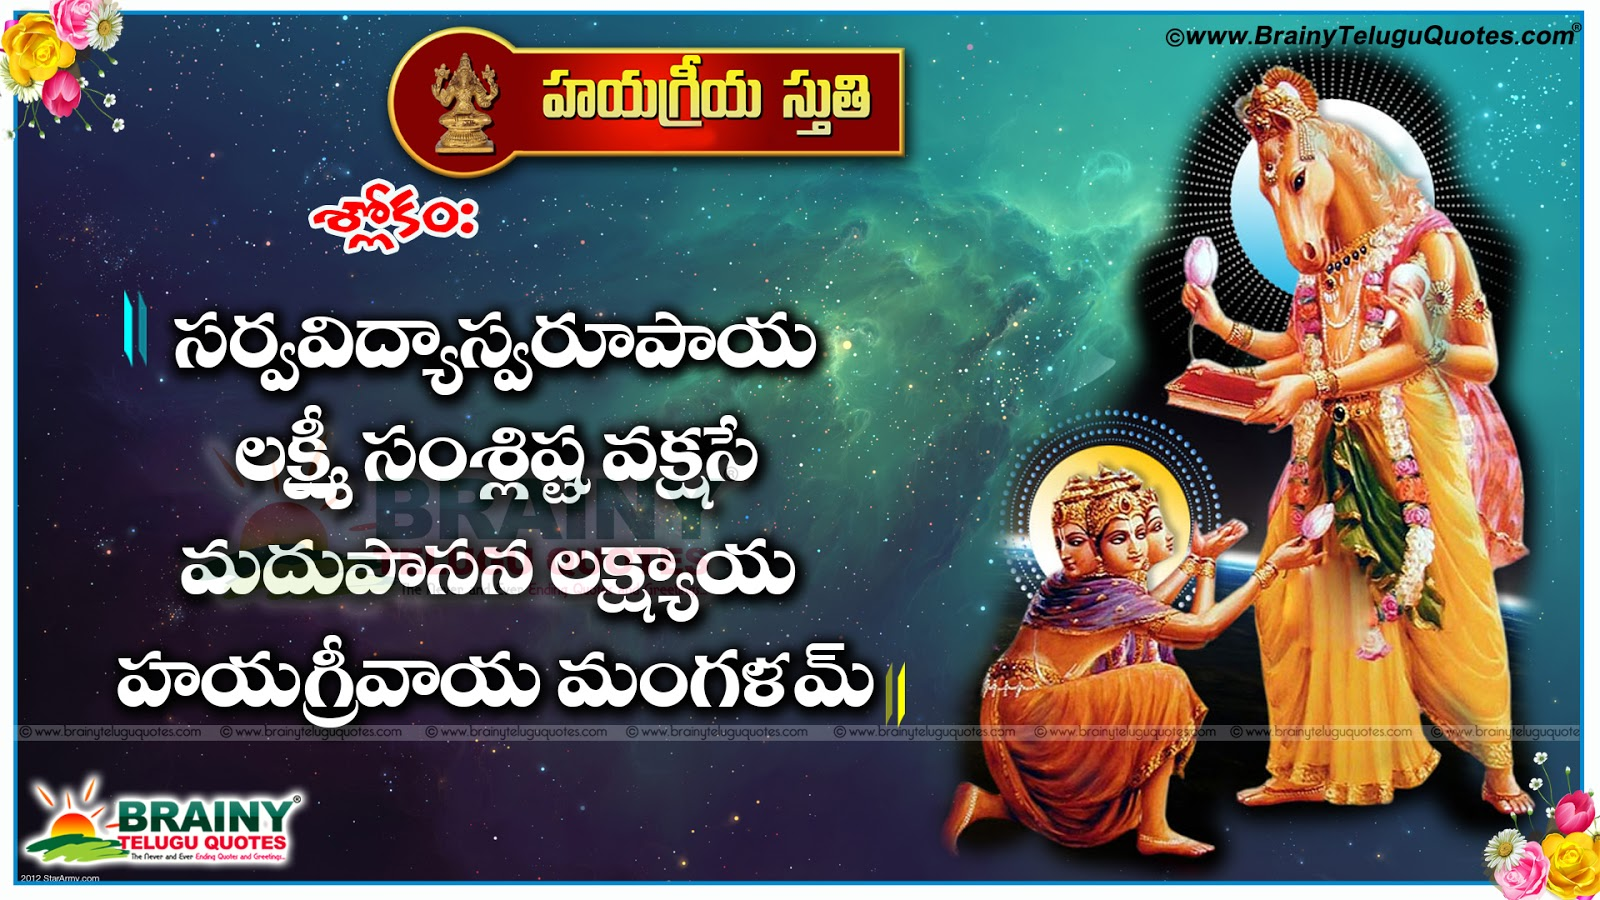 Sri Hayagriva Stuti Prayers For Children Hayagriva Mantra Lyrics Meaning And Benefits Brainyteluguquotes Comtelugu Quotes English Quotes Hindi Quotes Tamil Quotes Greetings